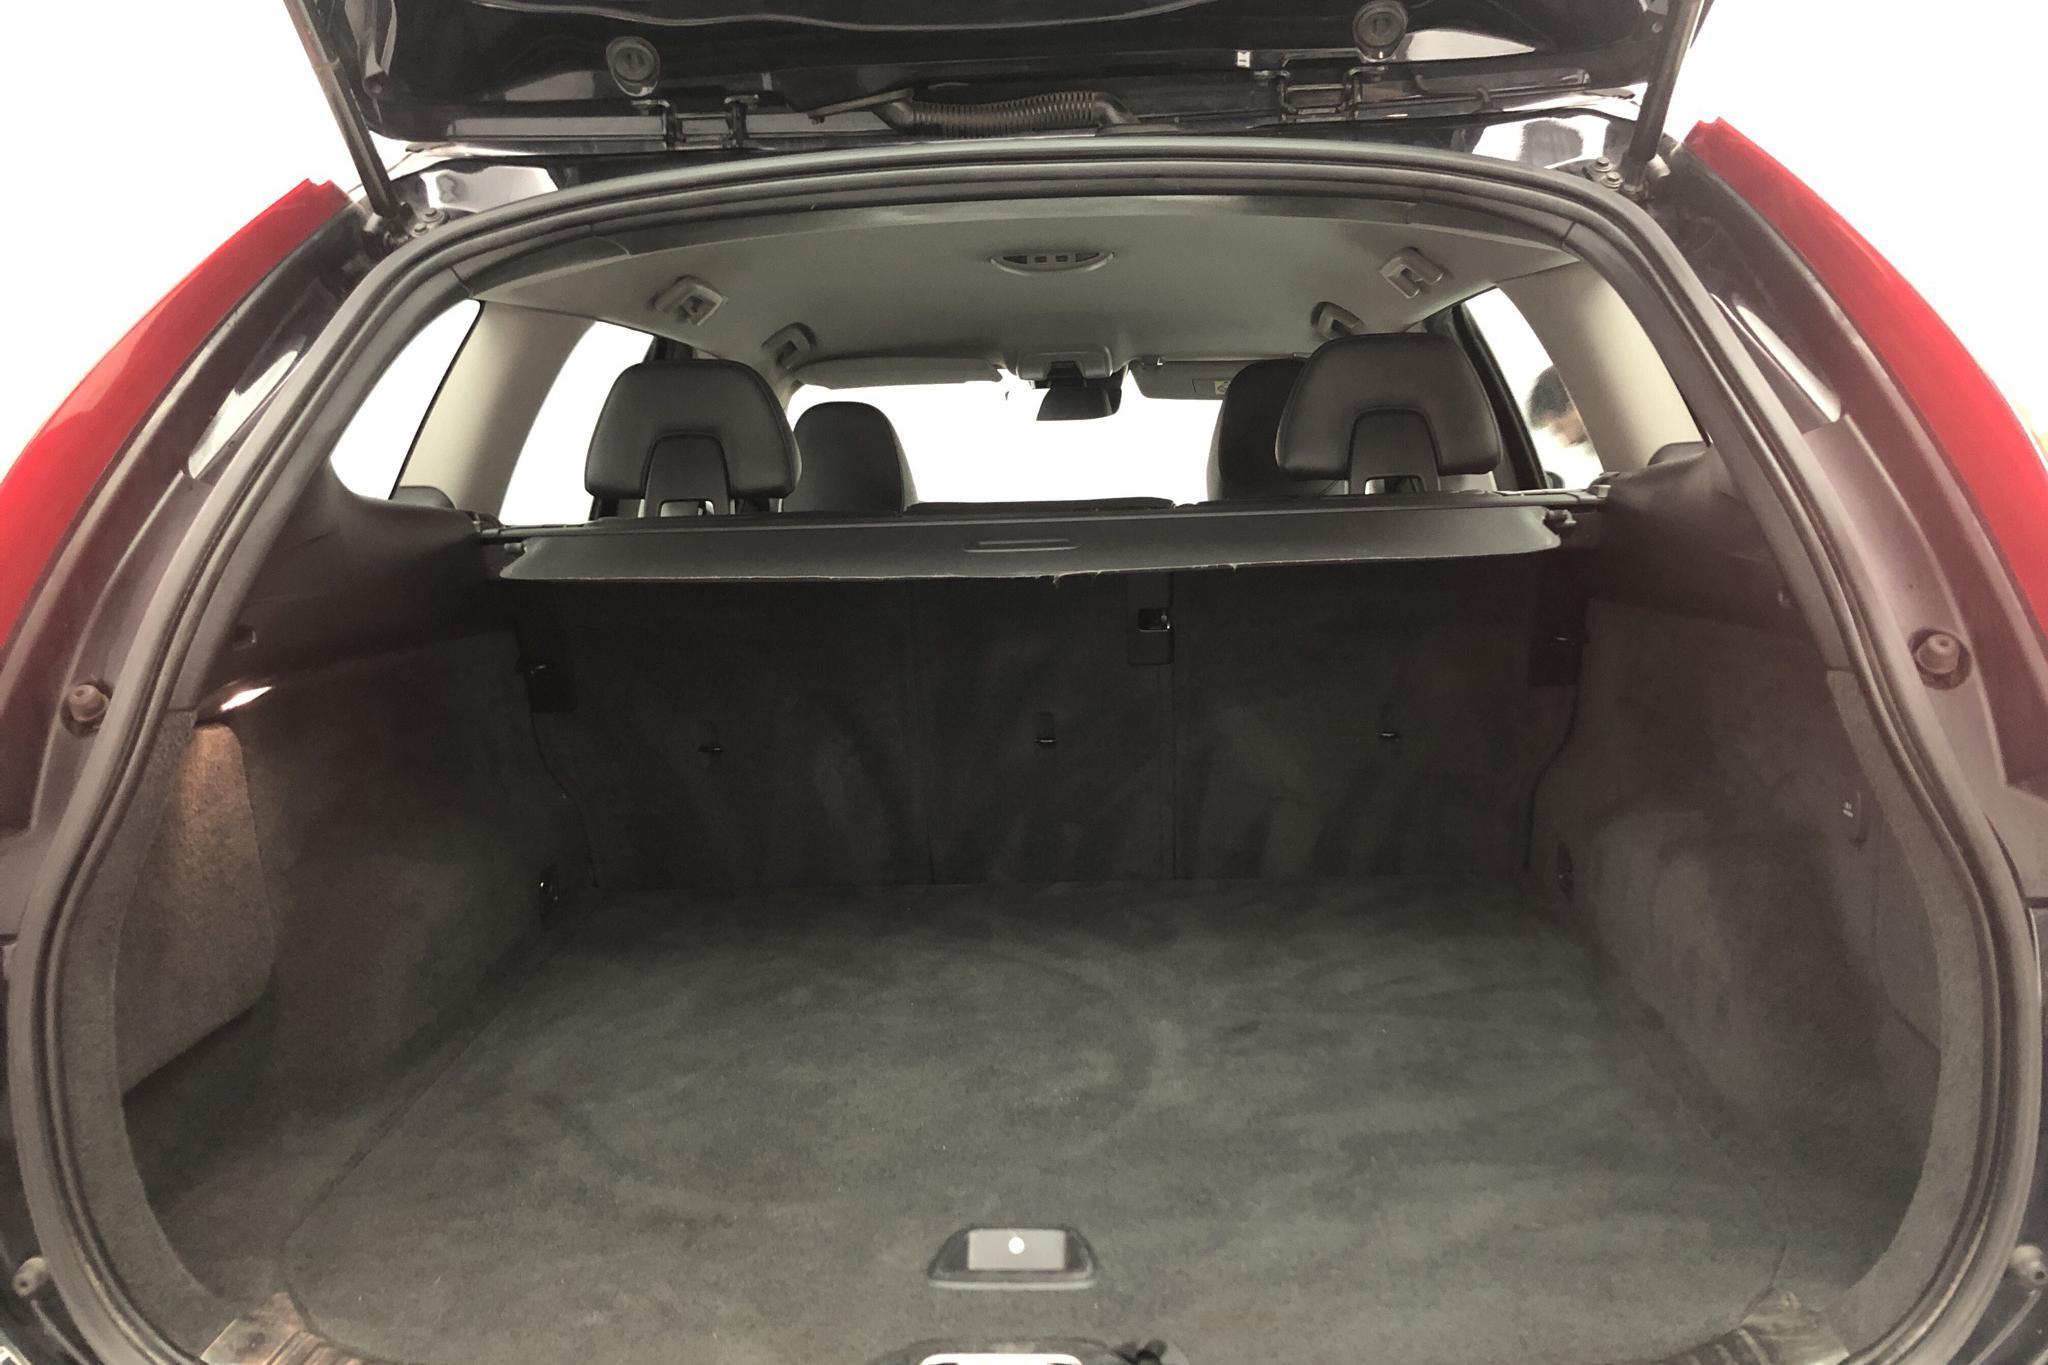 Volvo XC60 D4 AWD (181hk) - 160 550 km - Automatic - black - 2015